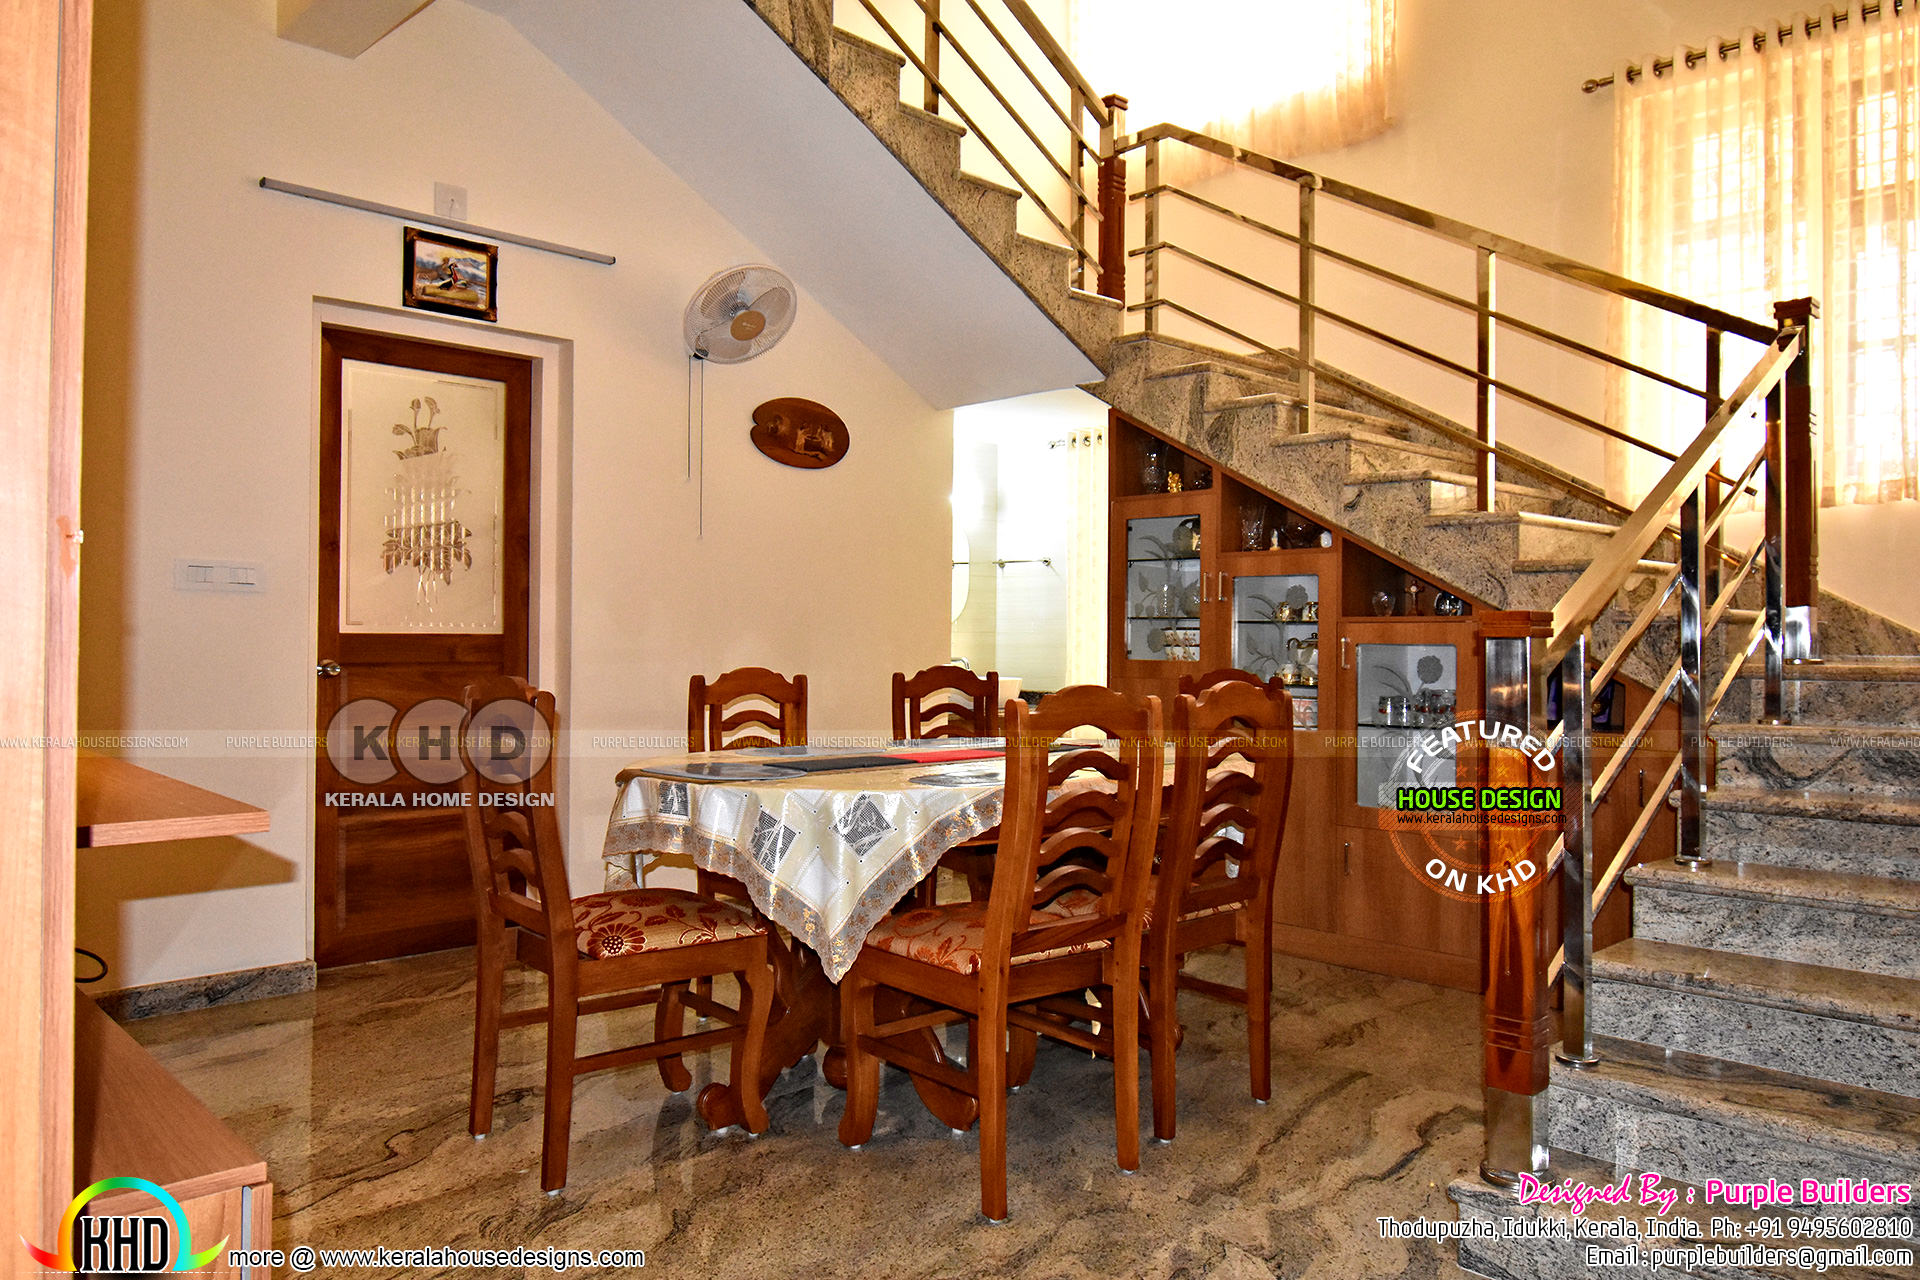 Interior Finished 4 Bedroom Kerala Home Plan Kerala Home